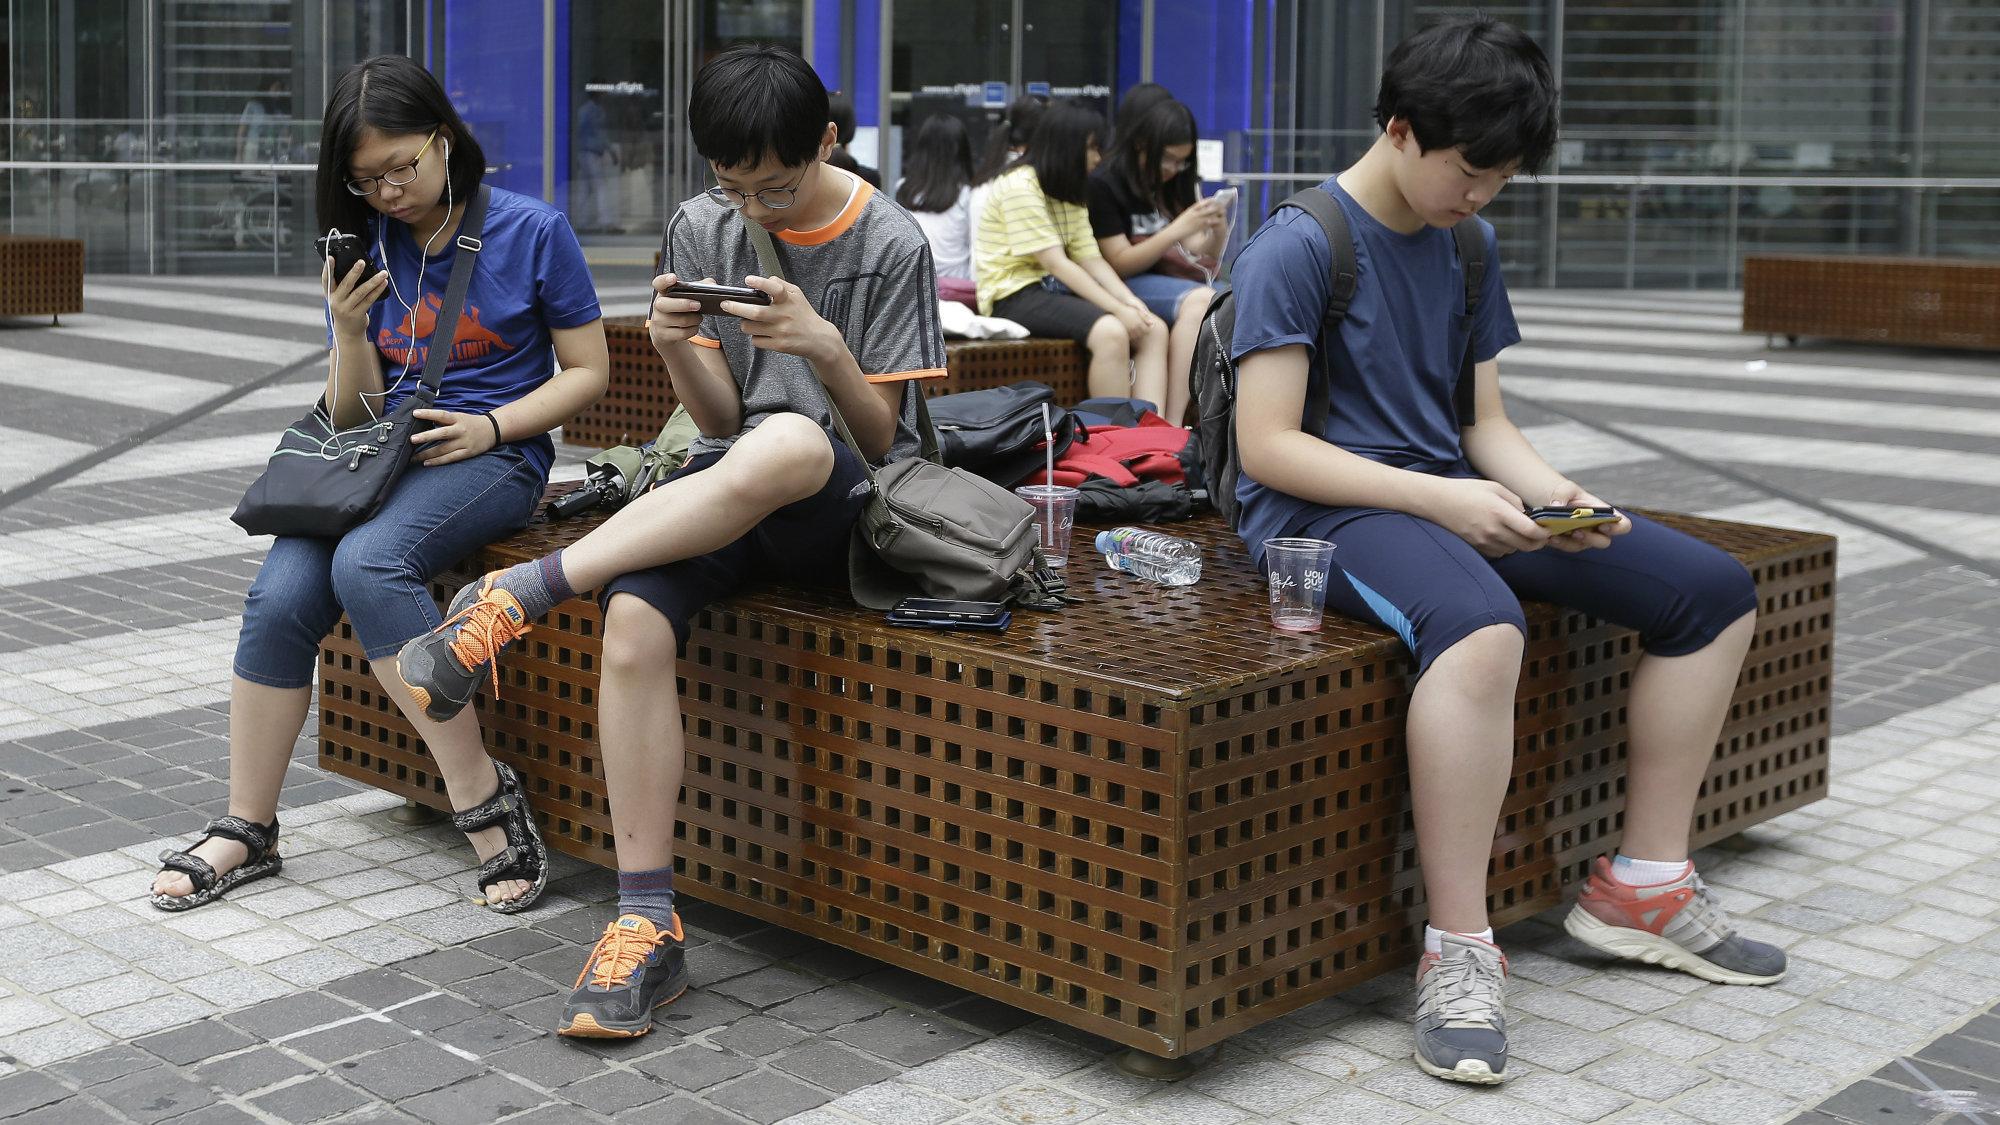 Teenagers looking at their mobile phones